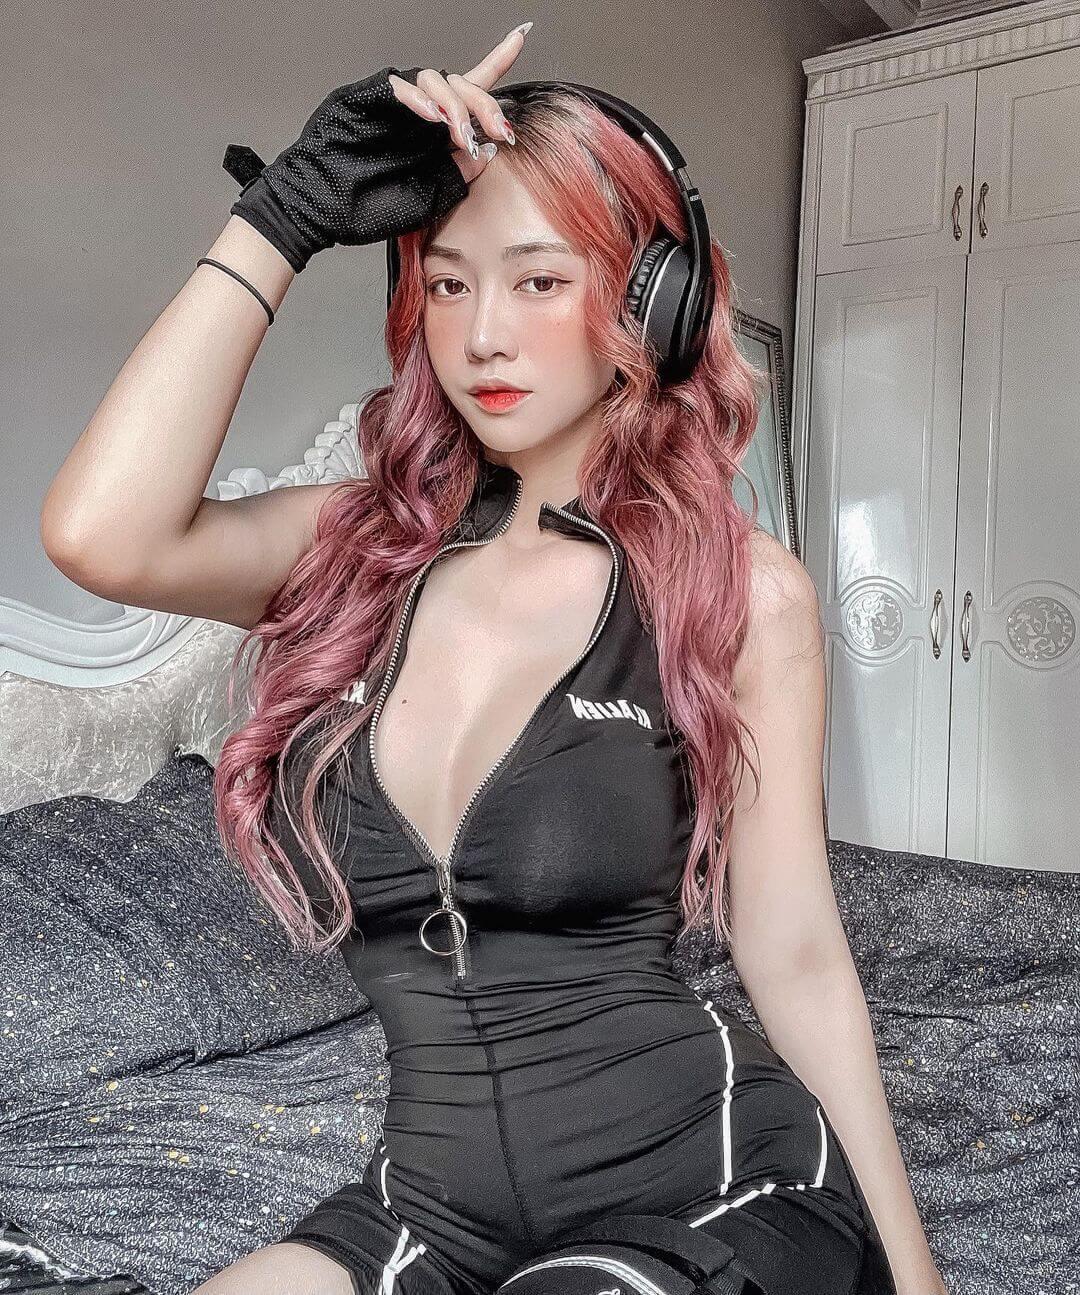 Le Xuan Anh (Le Bong)